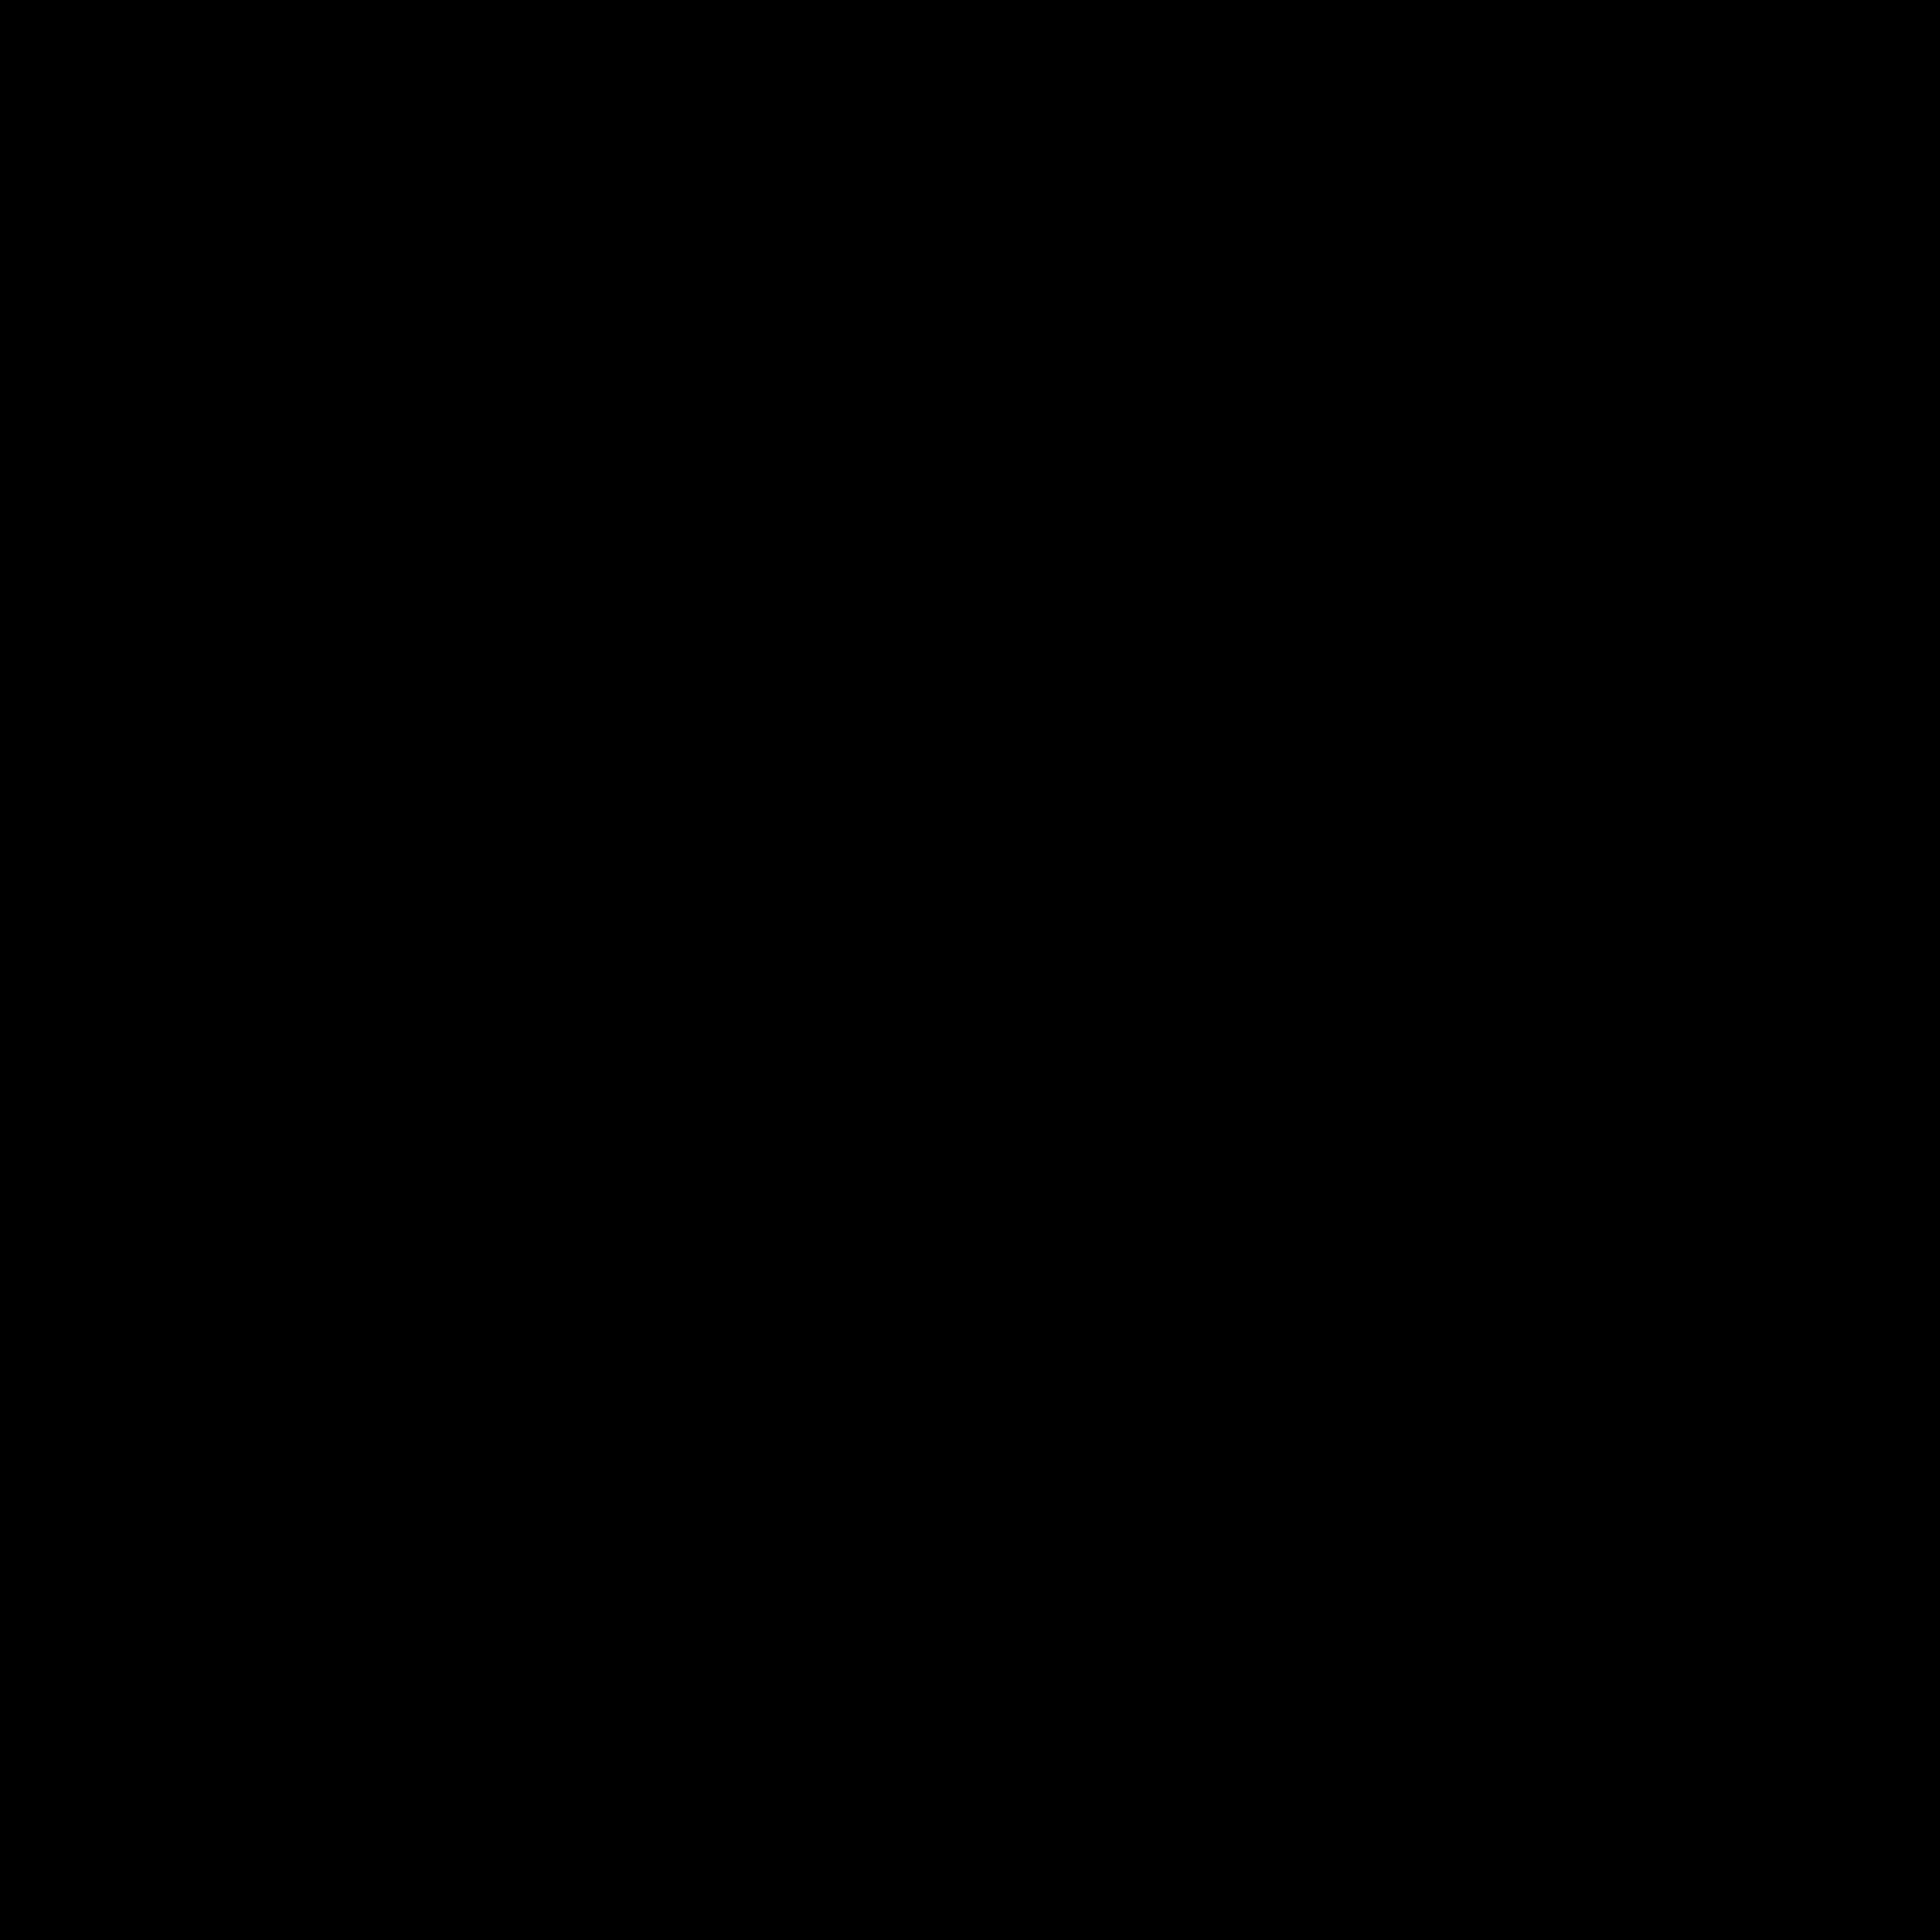 Requiro